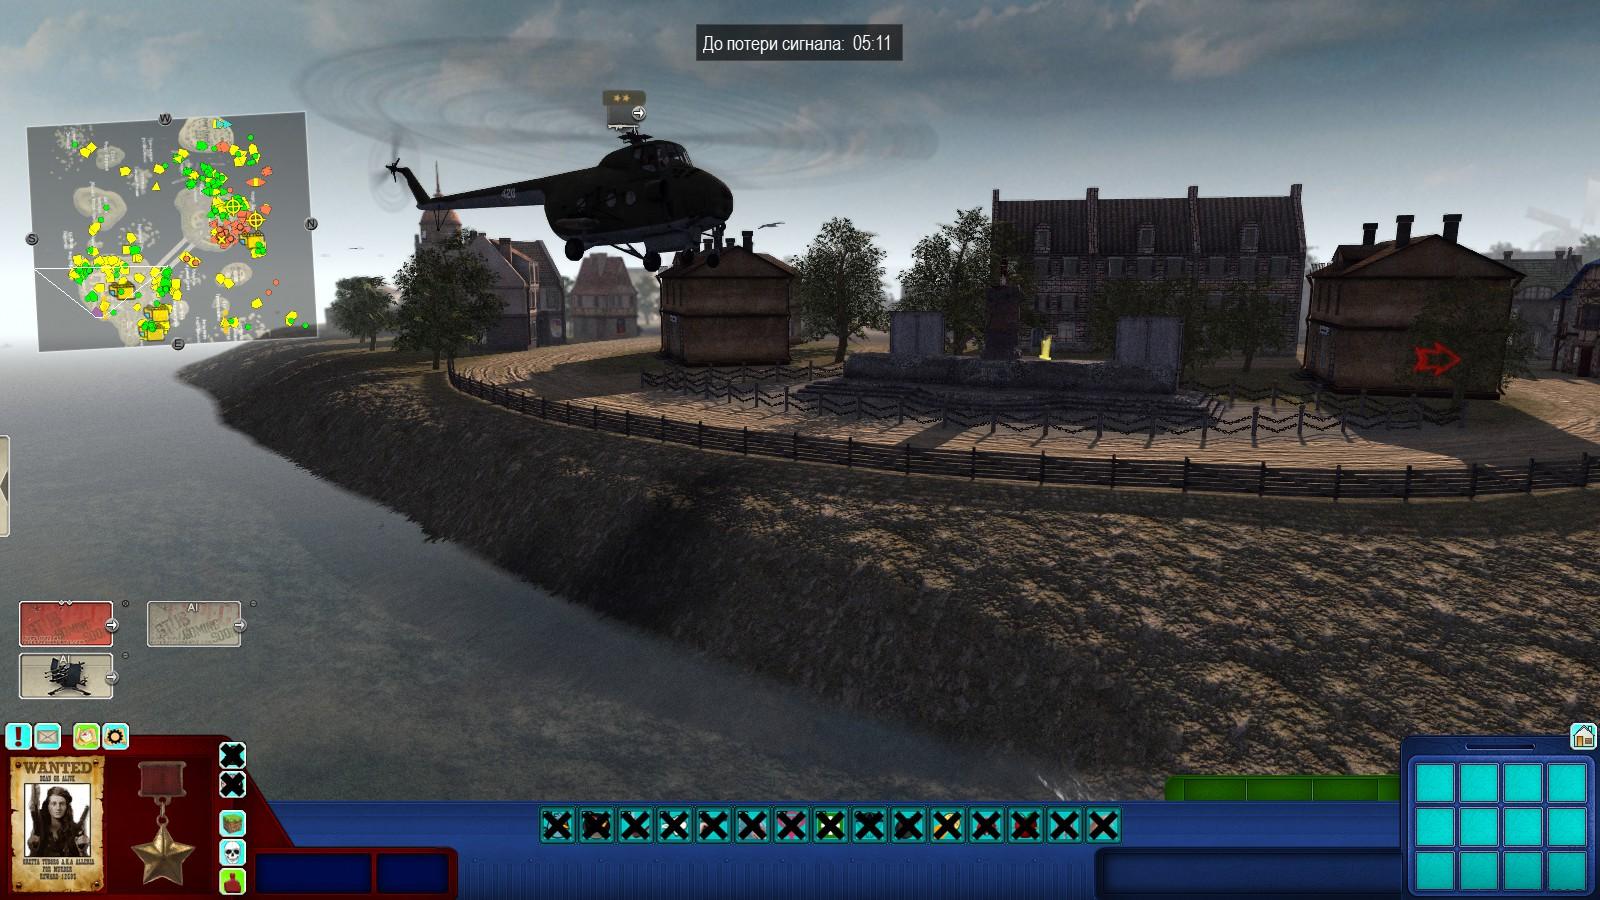 Gazmatera IV: Day Of The Bulldozer / Gazmatera IV: День Бульдозериста